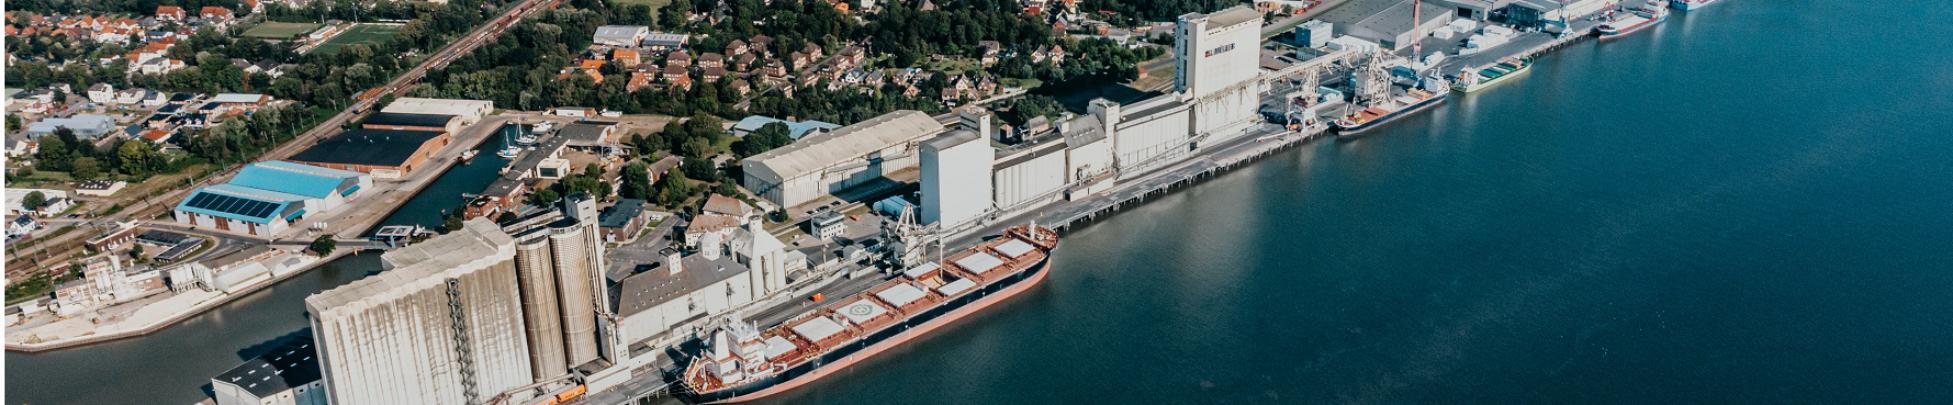 https://www.seaports.de/content/uploads/Luftaufnahme_Standort_Brake_web_banner.jpg